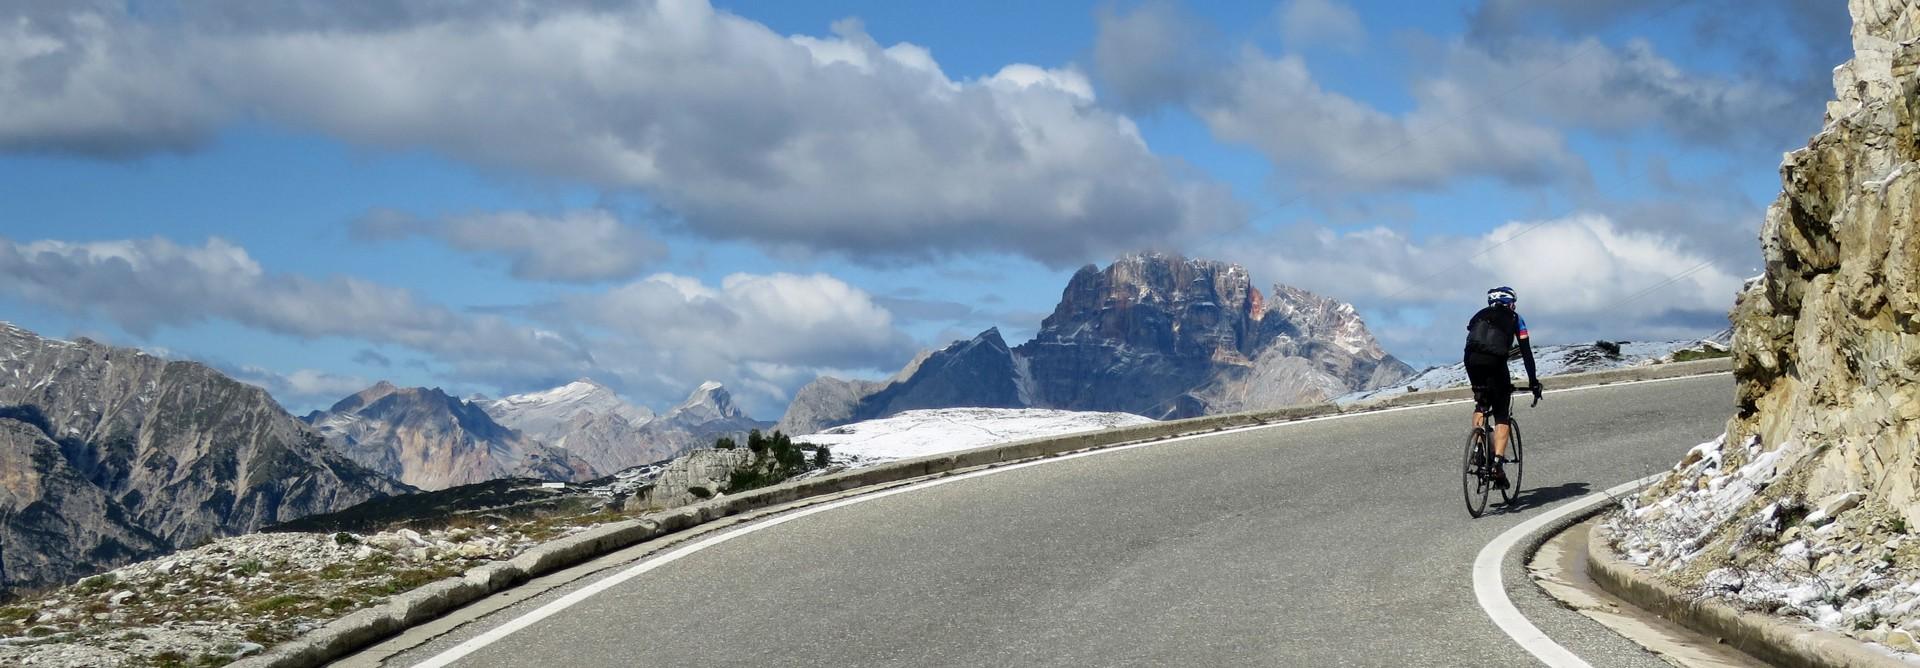 Raid Dolomiti.jpg - Italy - Raid Dolomiti - Guided Road Cycling Holiday - Road Cycling